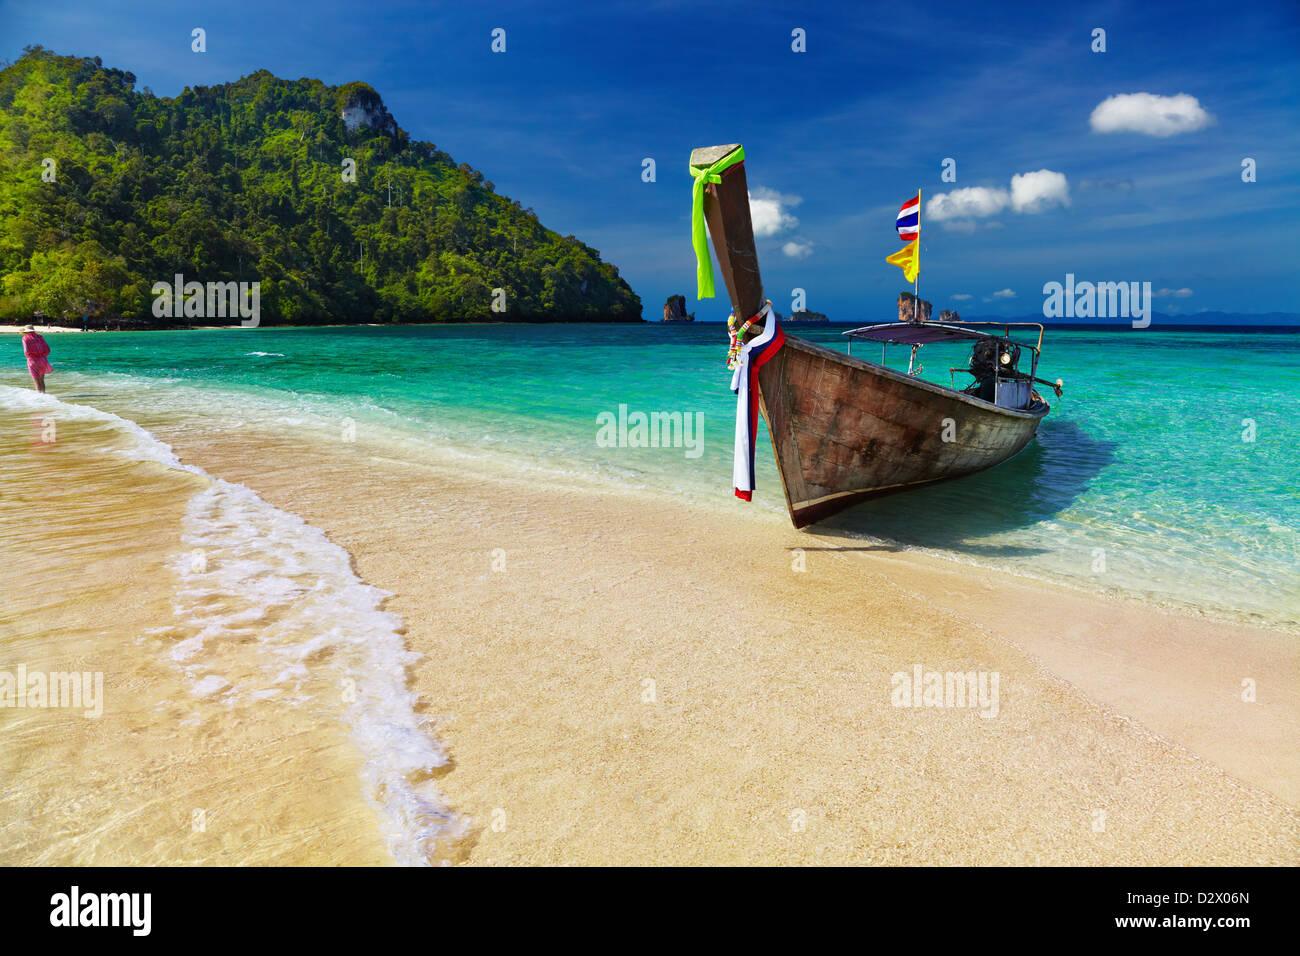 Longtail boat, Tropical beach, Tub Island, Andaman Sea, Thailand - Stock Image